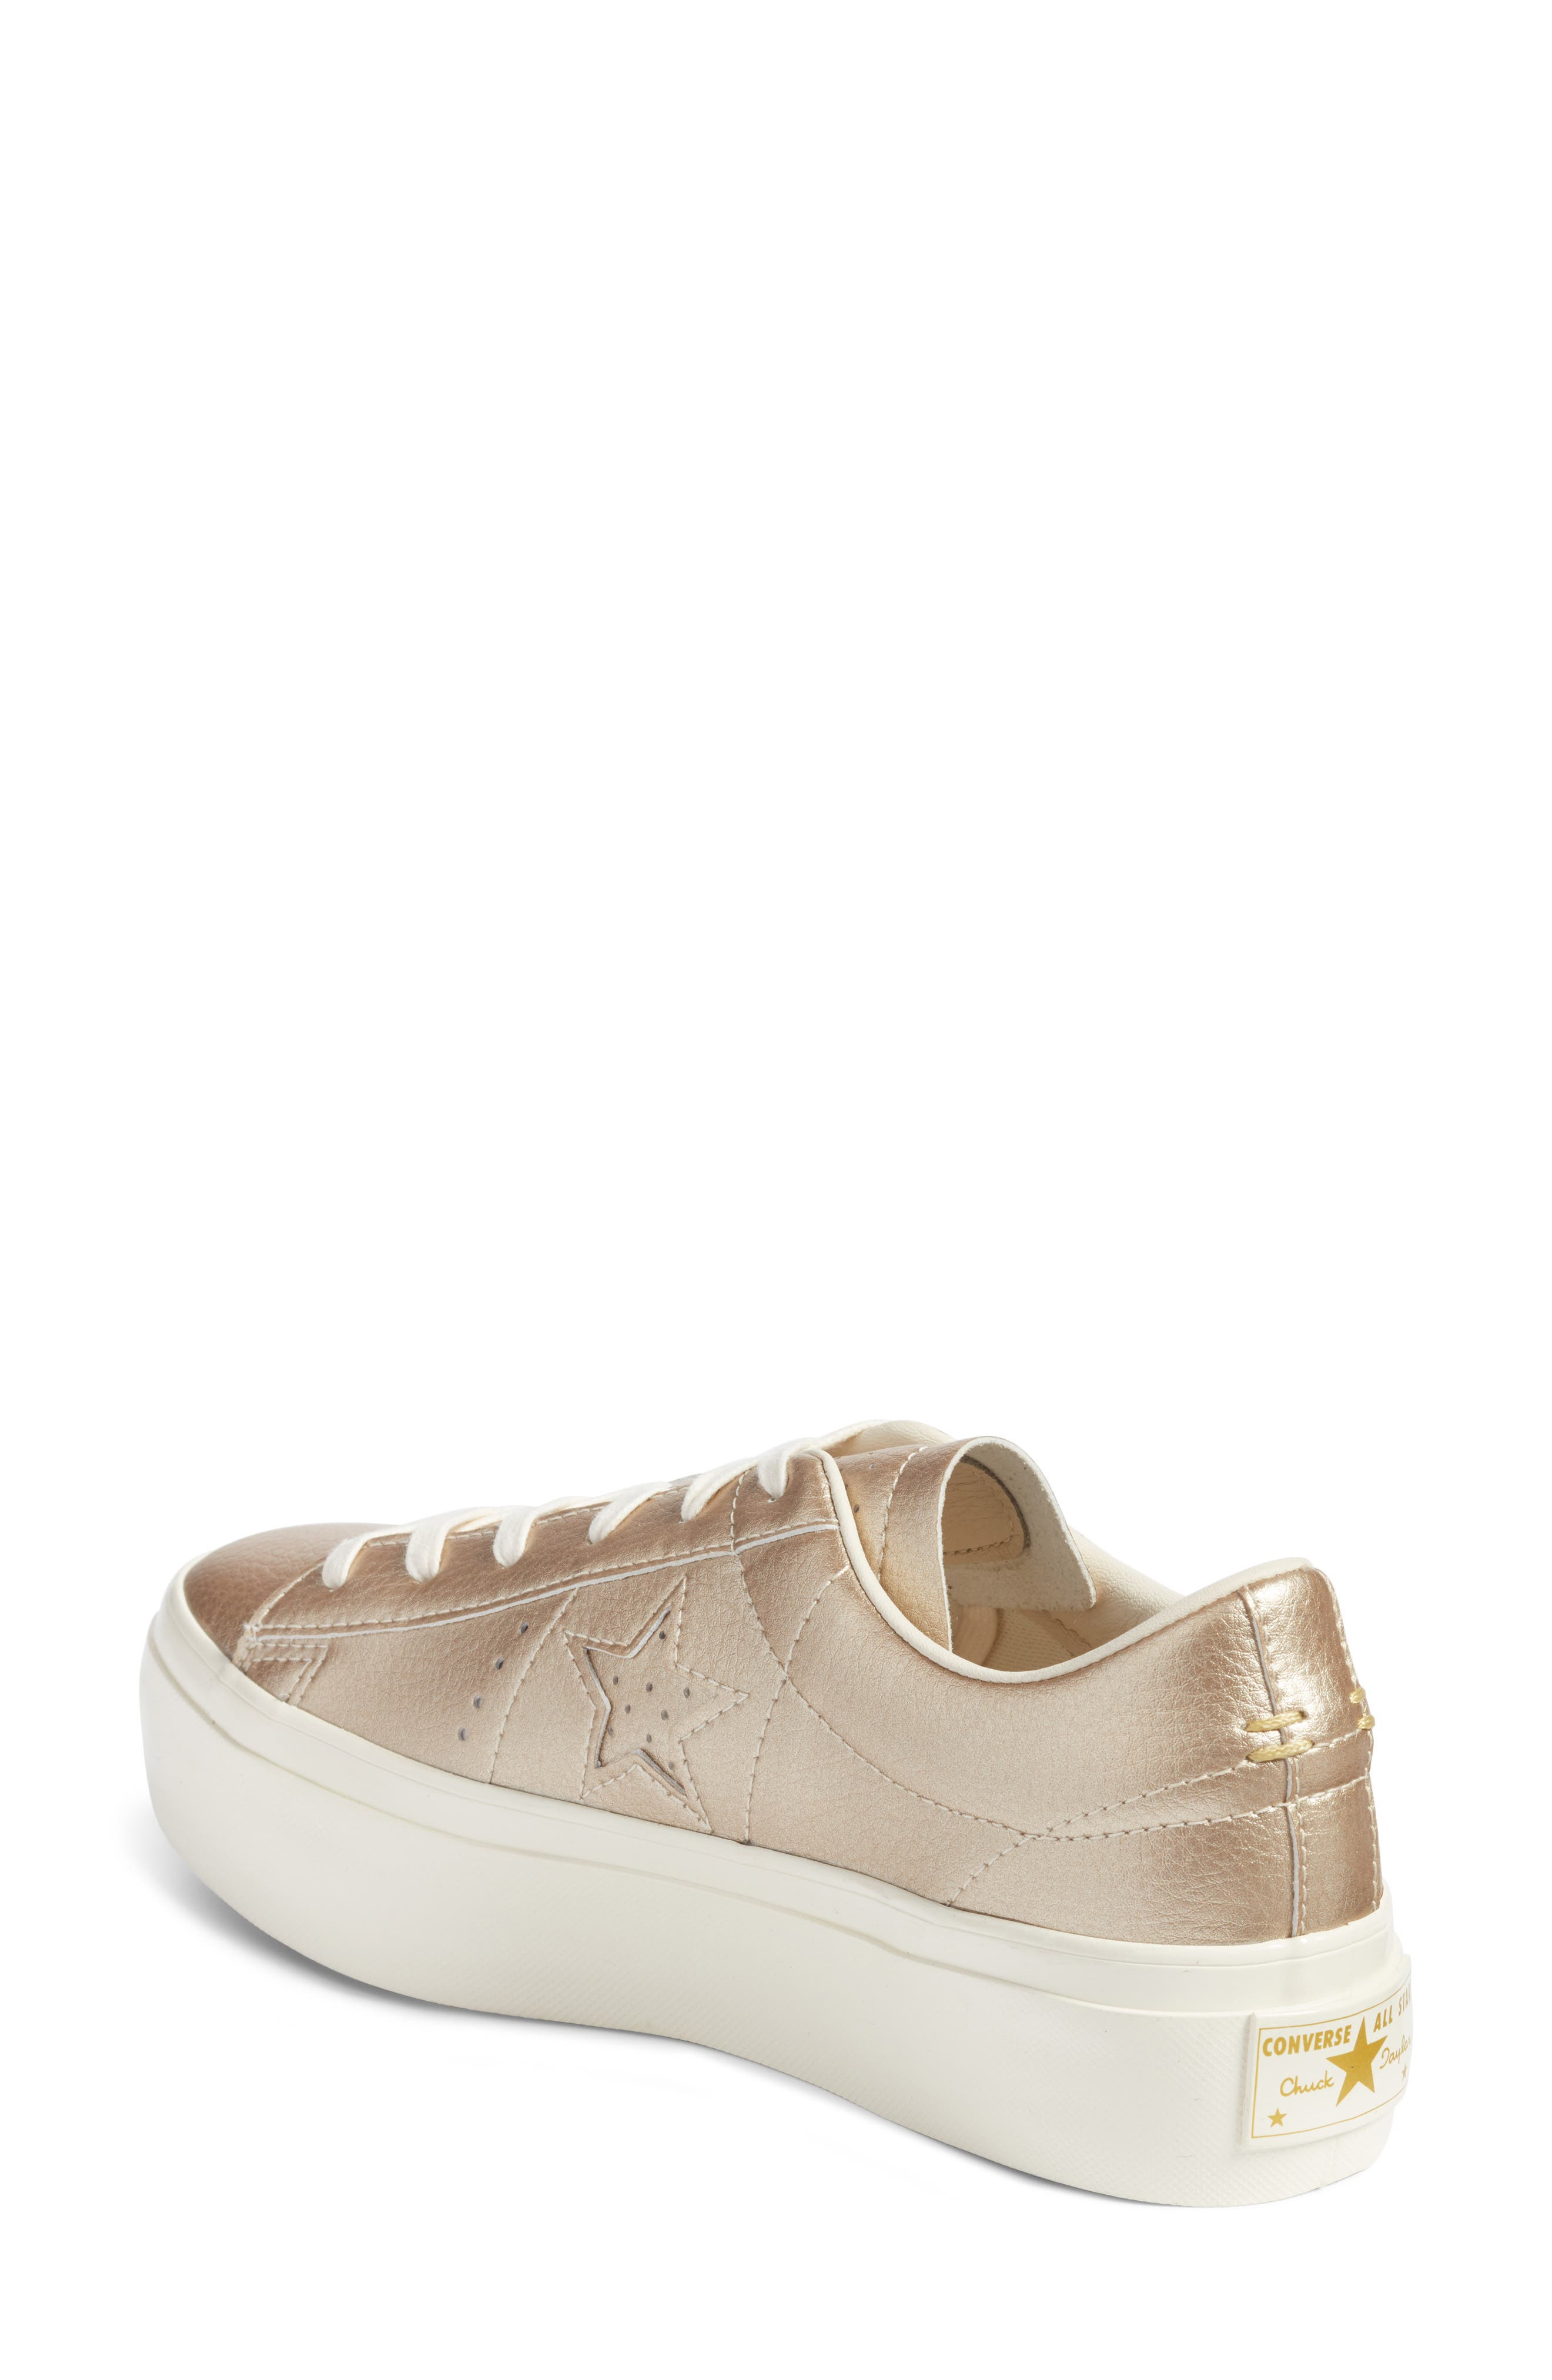 Alternate Image 2  - Converse Chuck Taylor® All Star® One Star Metallic Platform Sneaker (Women)